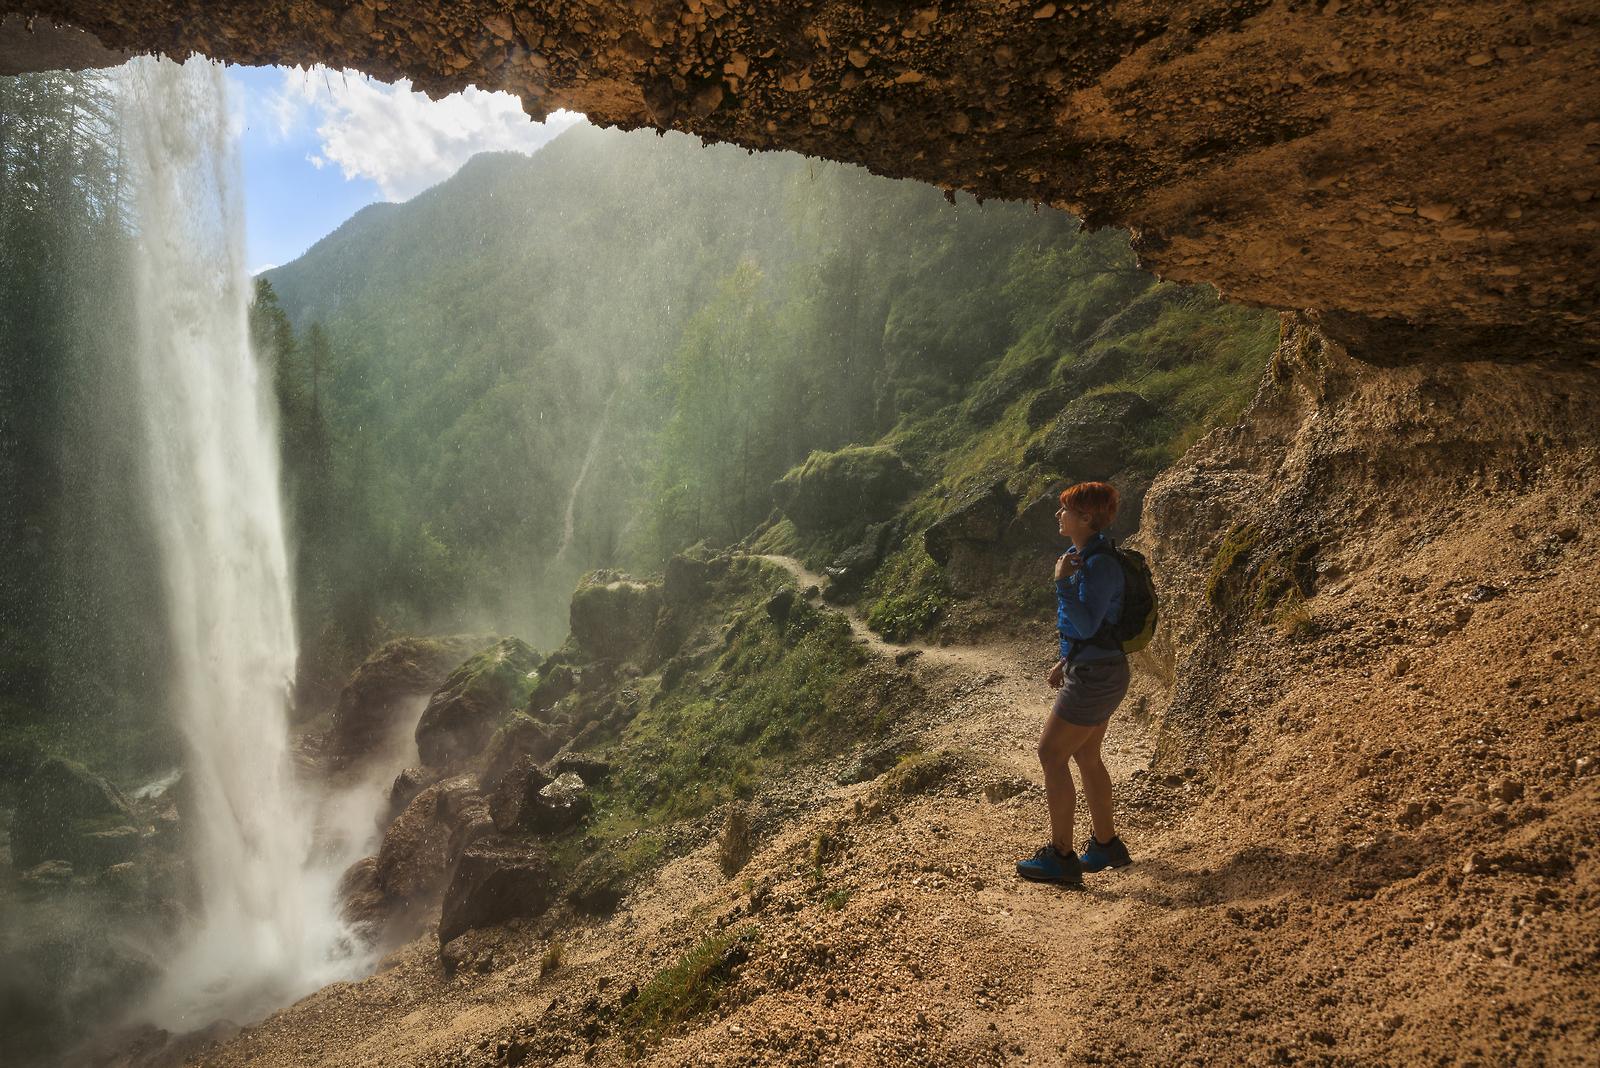 Waterfalls in Slovenia - waterfall Pericnik